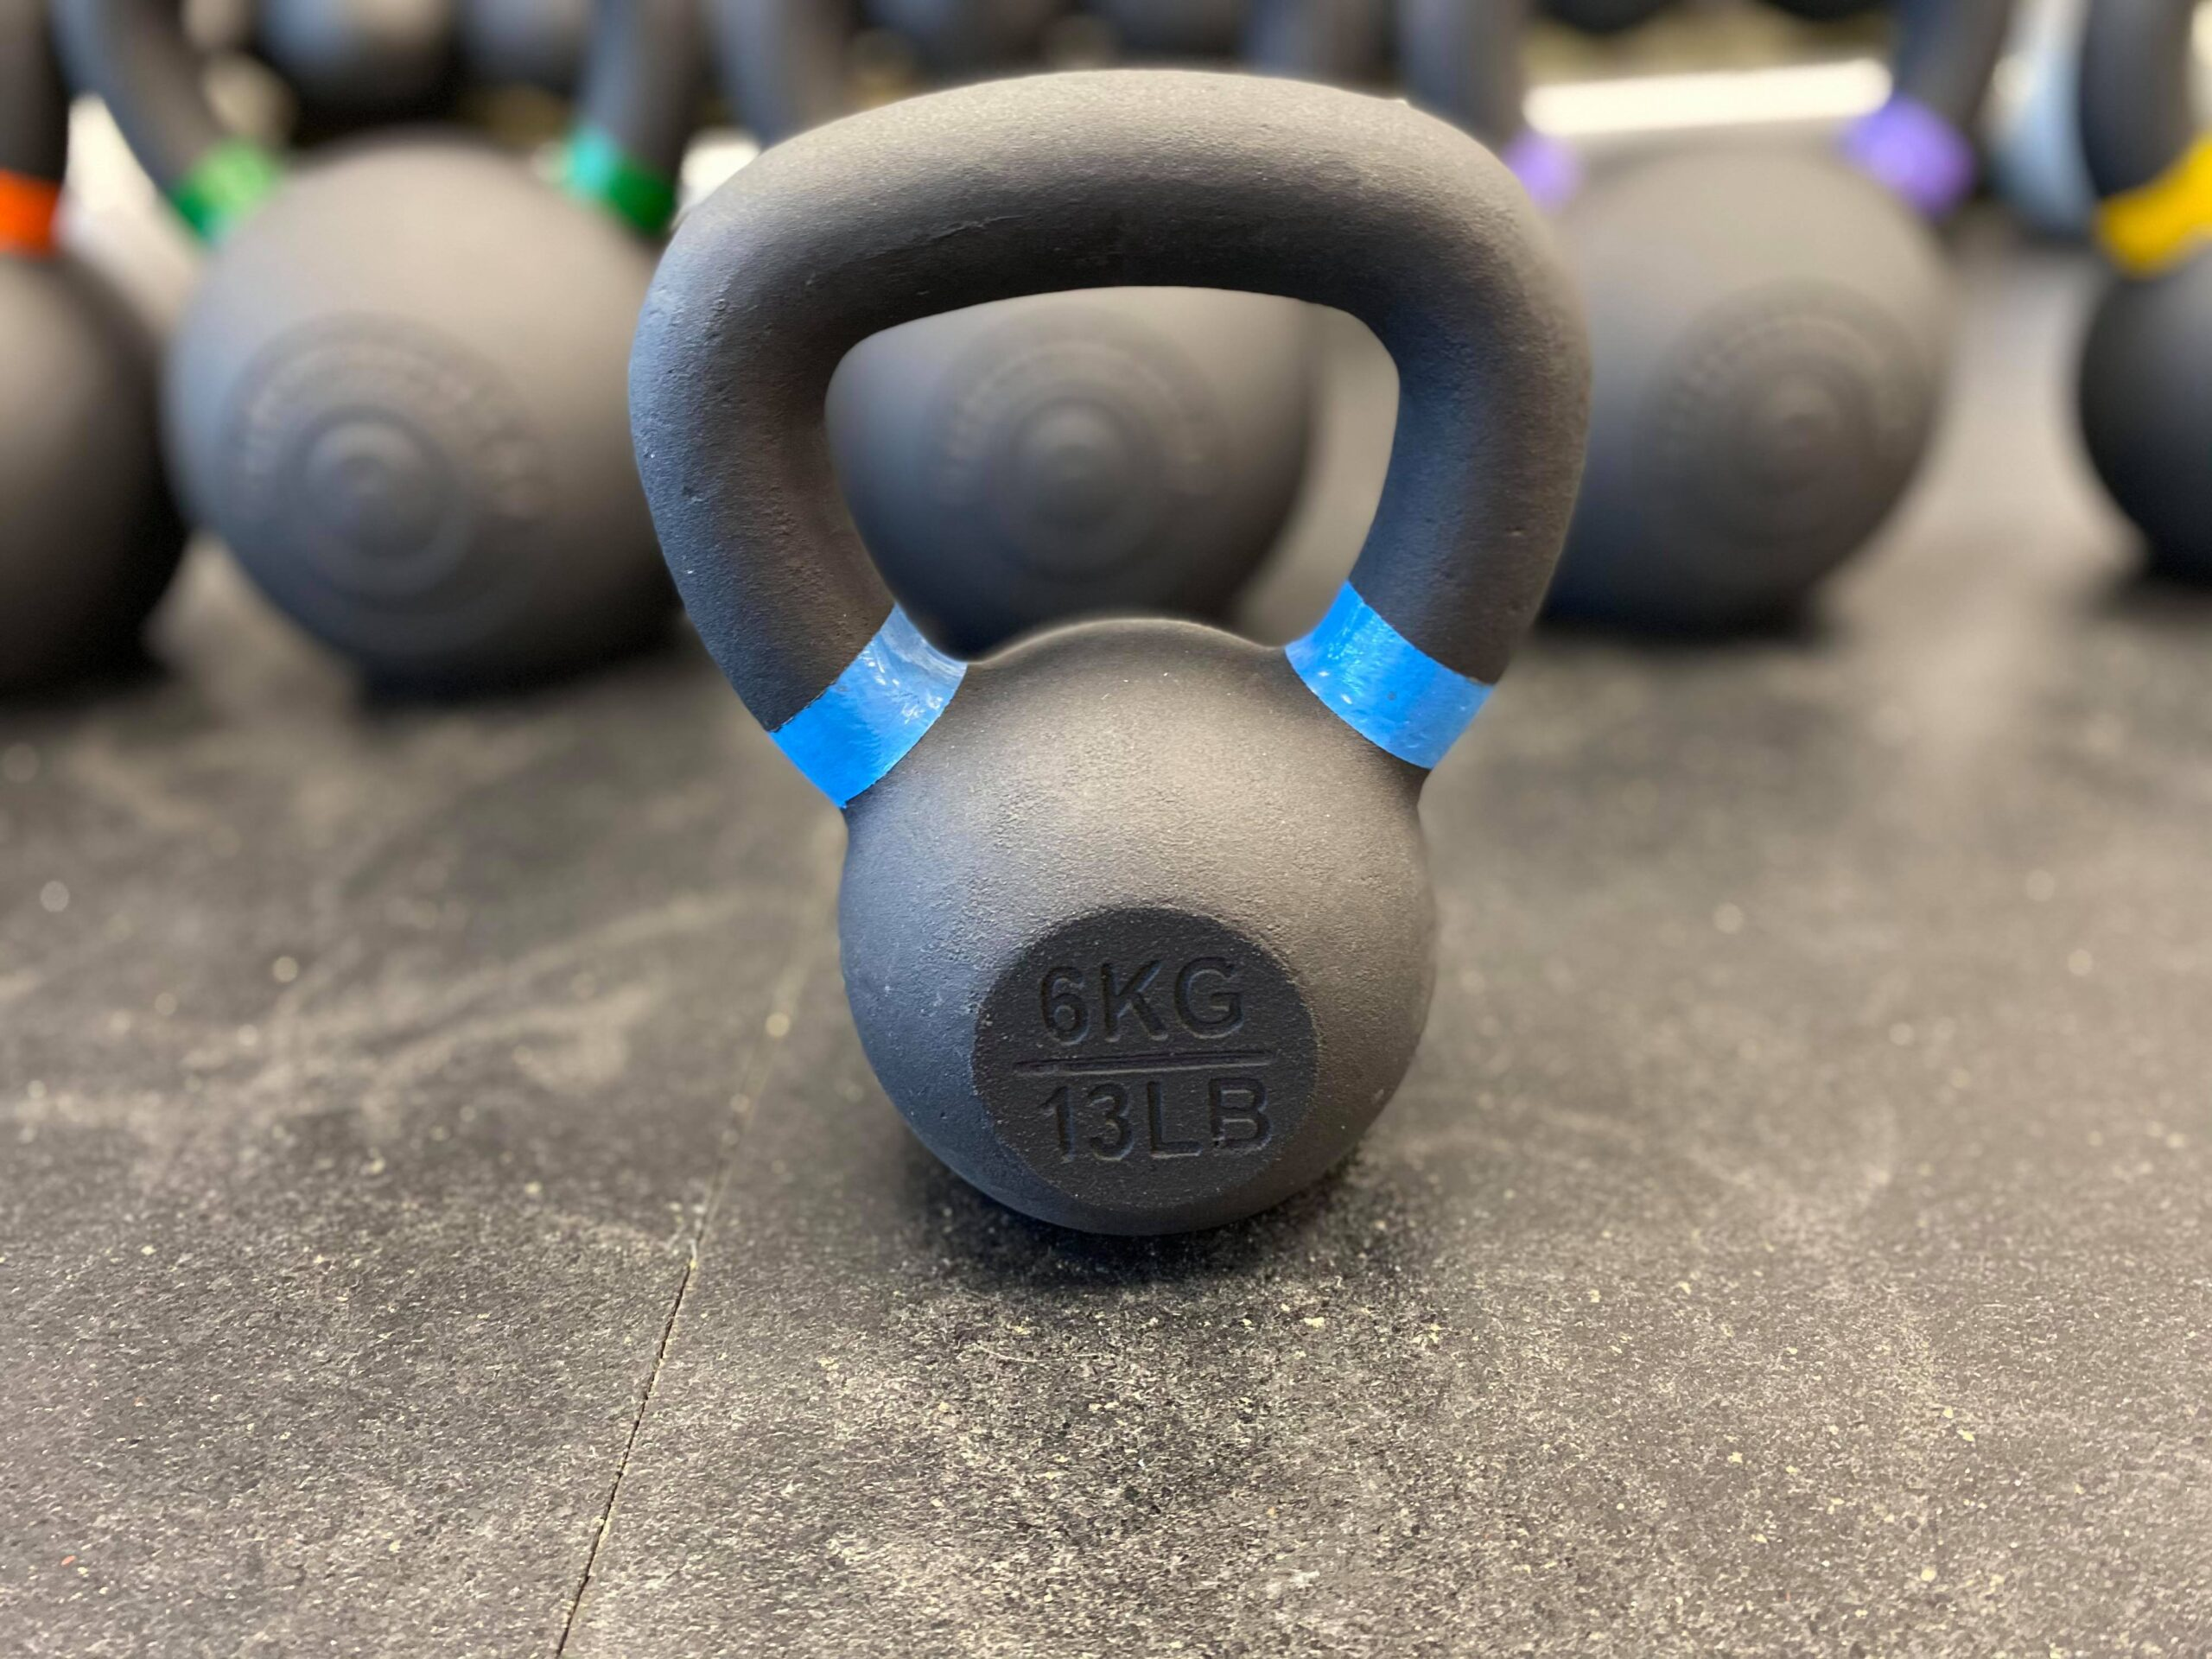 6kg/ 13lbs Kettlebell